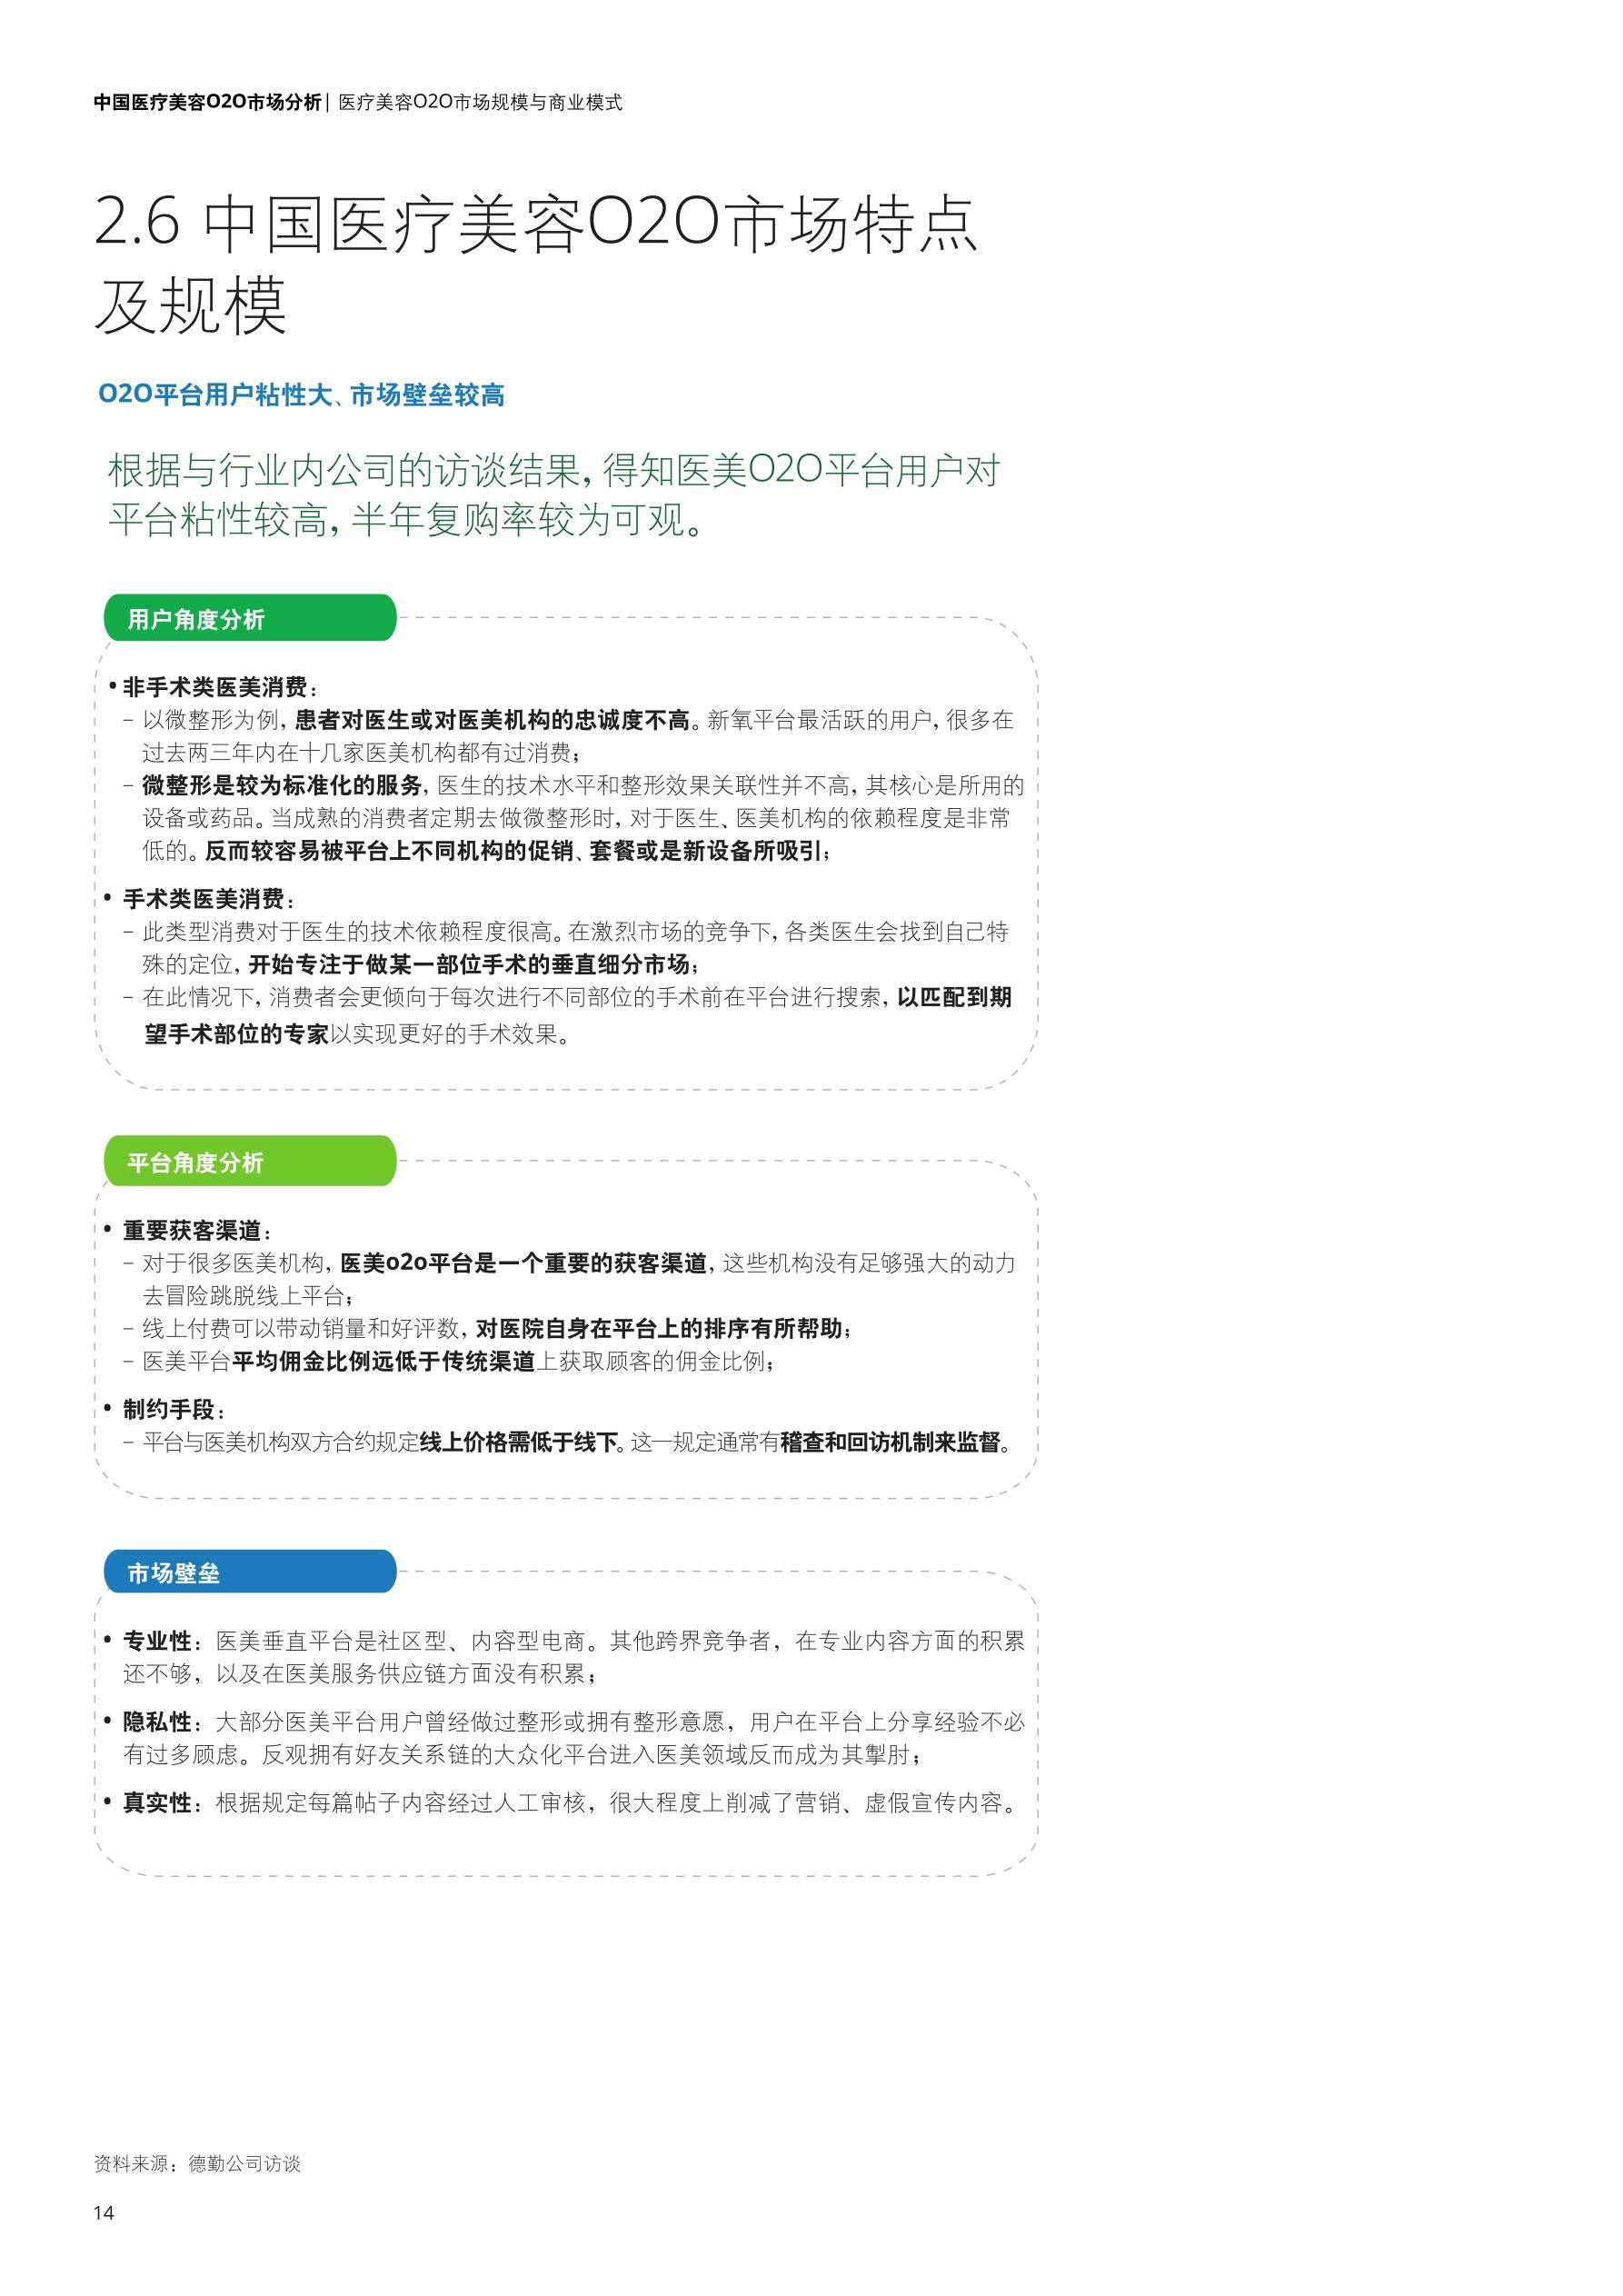 deloitte-cn-lshc-china-medical-cosmetology-o2o-market-analysis-zh-180914(1)_看图王_16